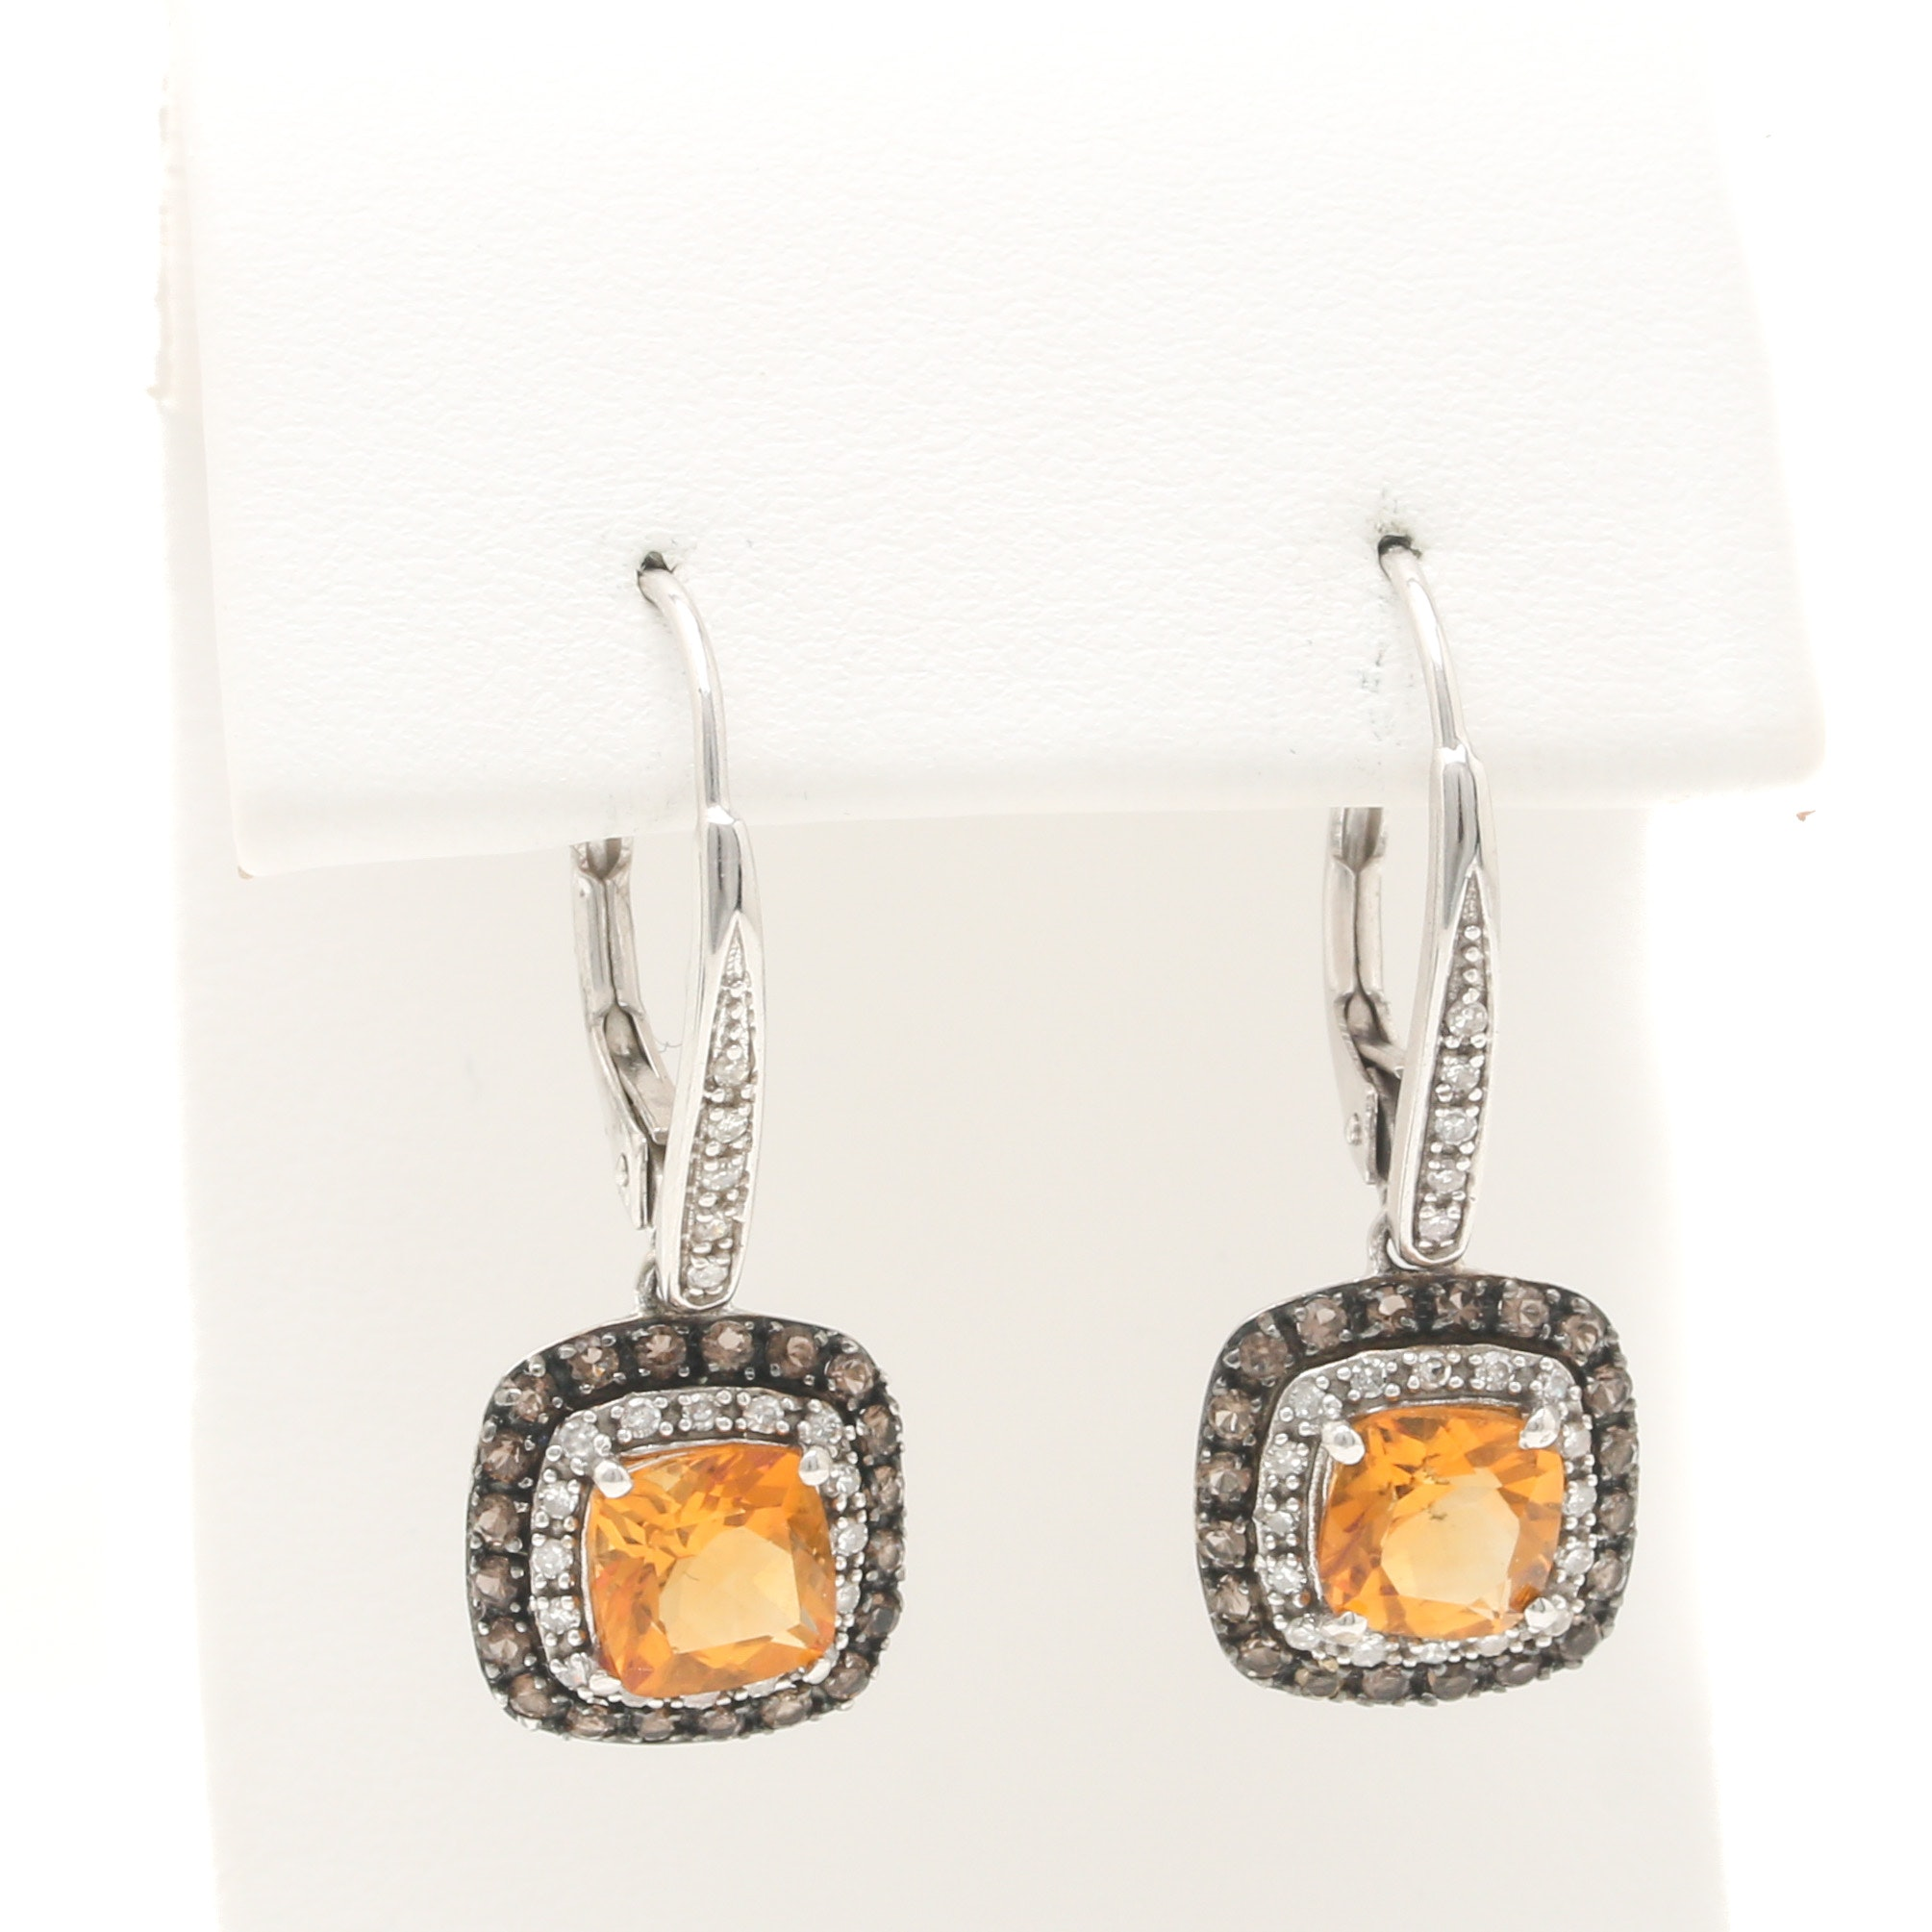 10K White Gold Citrine Smoky Quartz and Diamond Dangle Earrings